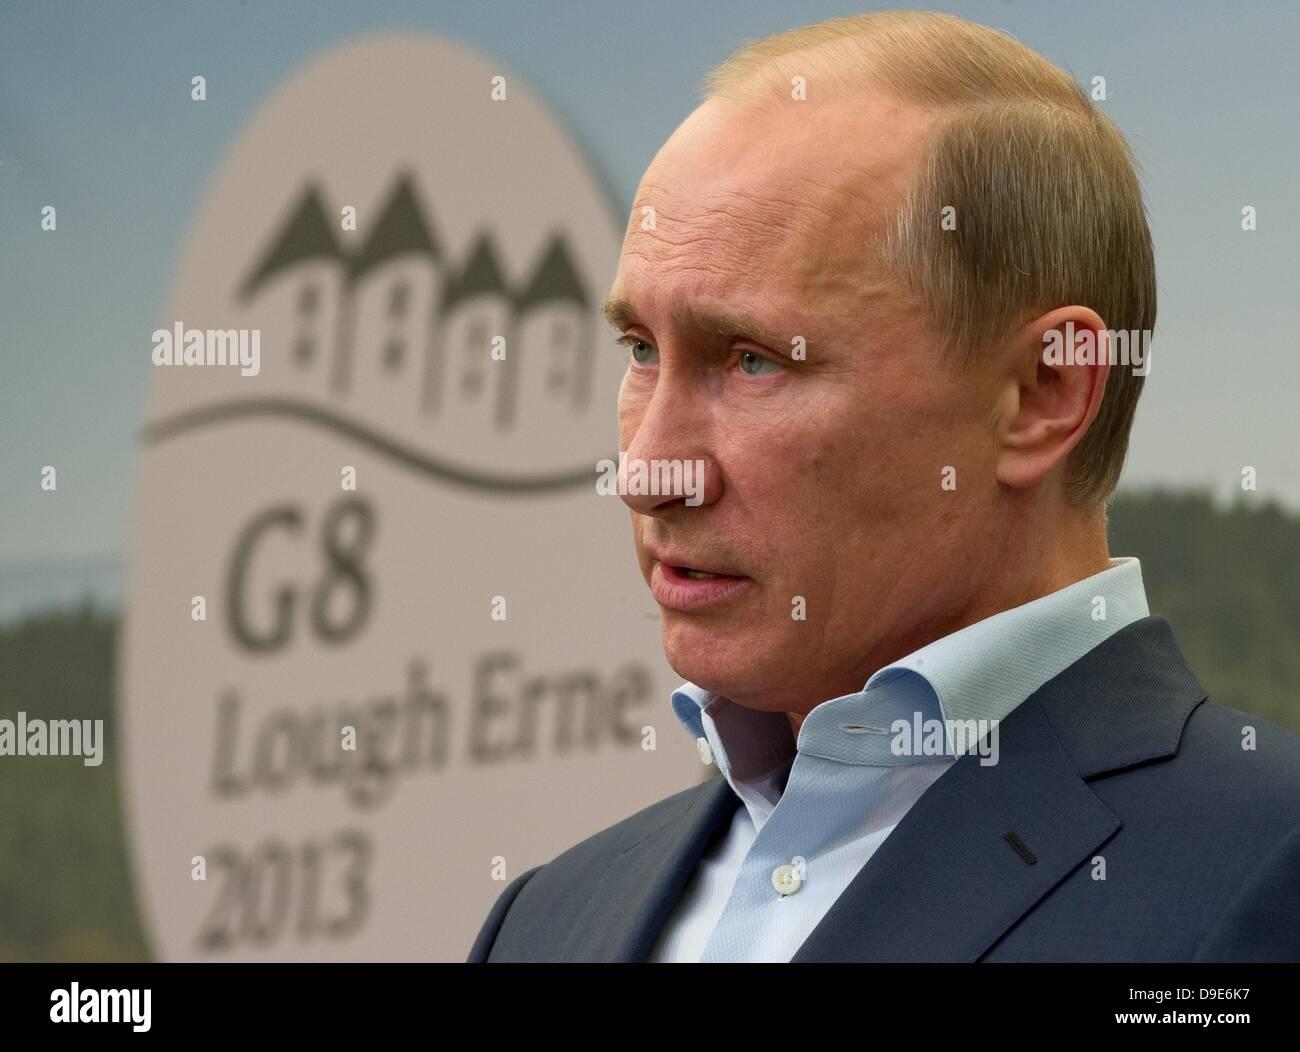 Enniskillen, Northern Ireland,  UK. 18th June 2013. Russian President Vladimir Putin gives a press conference after - Stock Image